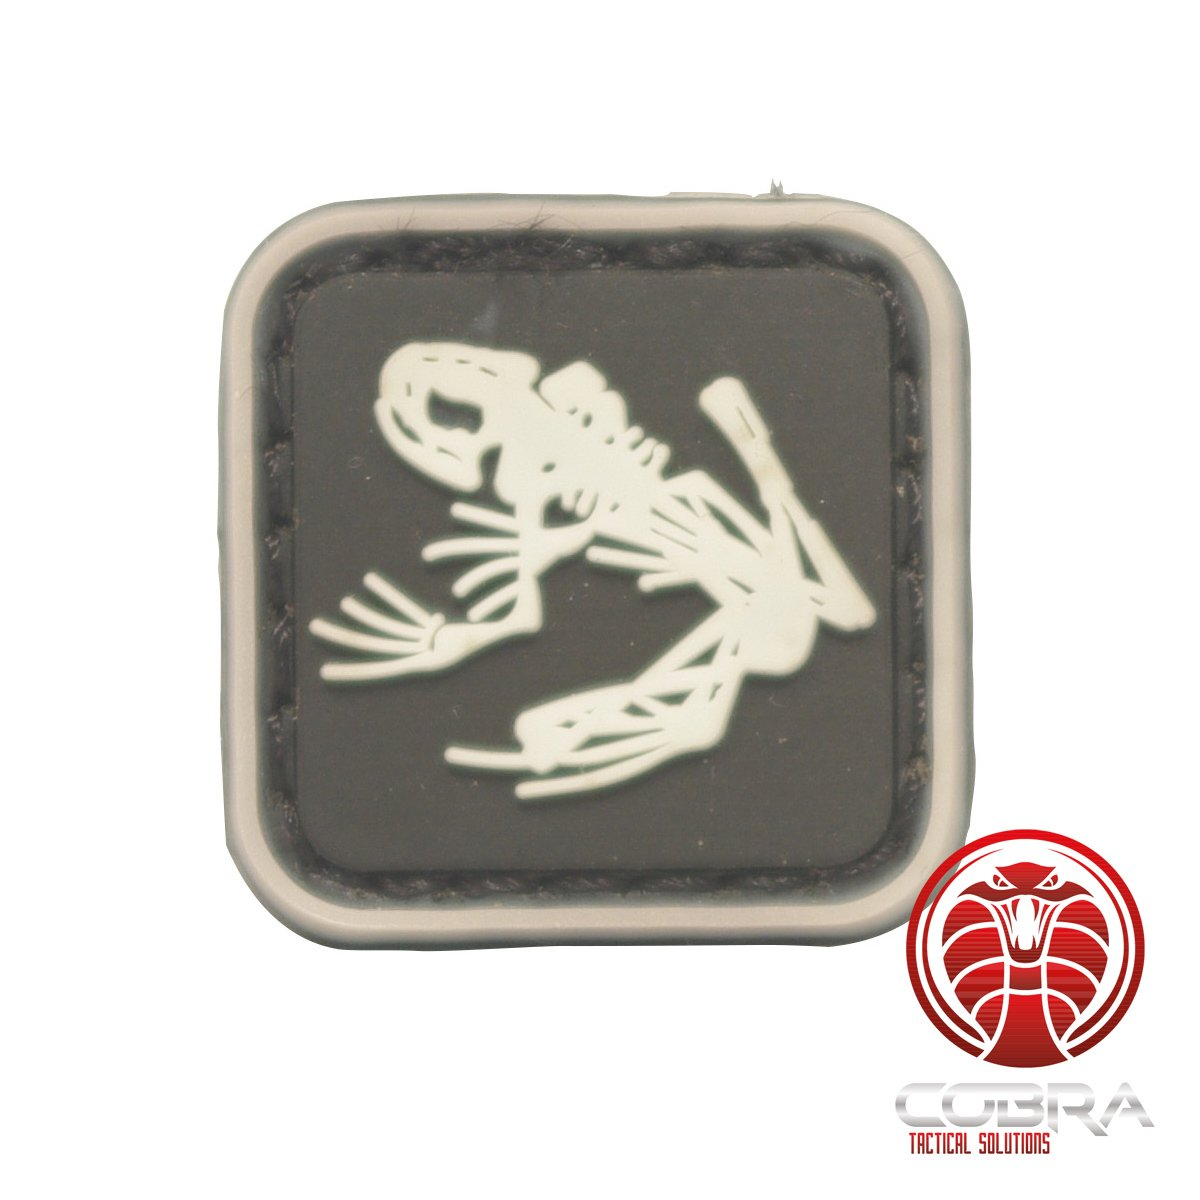 Cobra Tactical Solutions Parche Militar US Marina Navy Seals Bone Frog Skull Skeleton DEVGRU Insignia Moral NSWDG USSOCOM PVC con su cord/ón Hook /& Loop para Airsoft Paintball